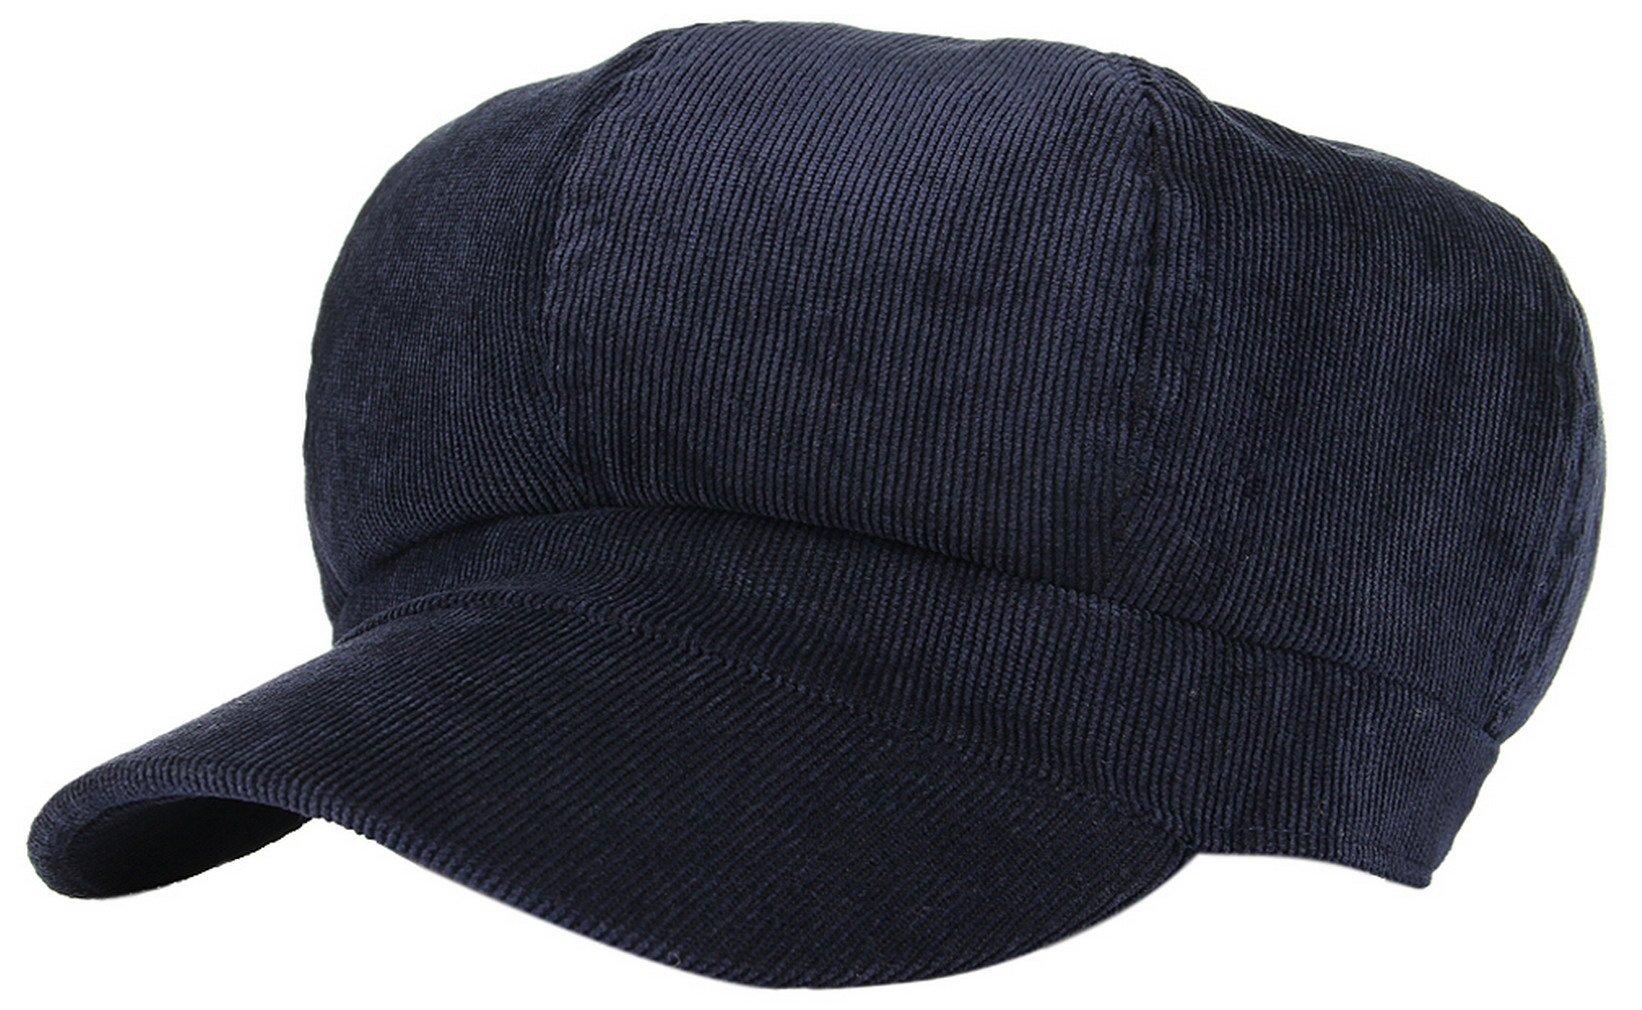 d6e6fc4591f GEMVIE Women Corduroy 8 Panel Newsboy Baker Boy Cap Peaked Beret Hat  product image